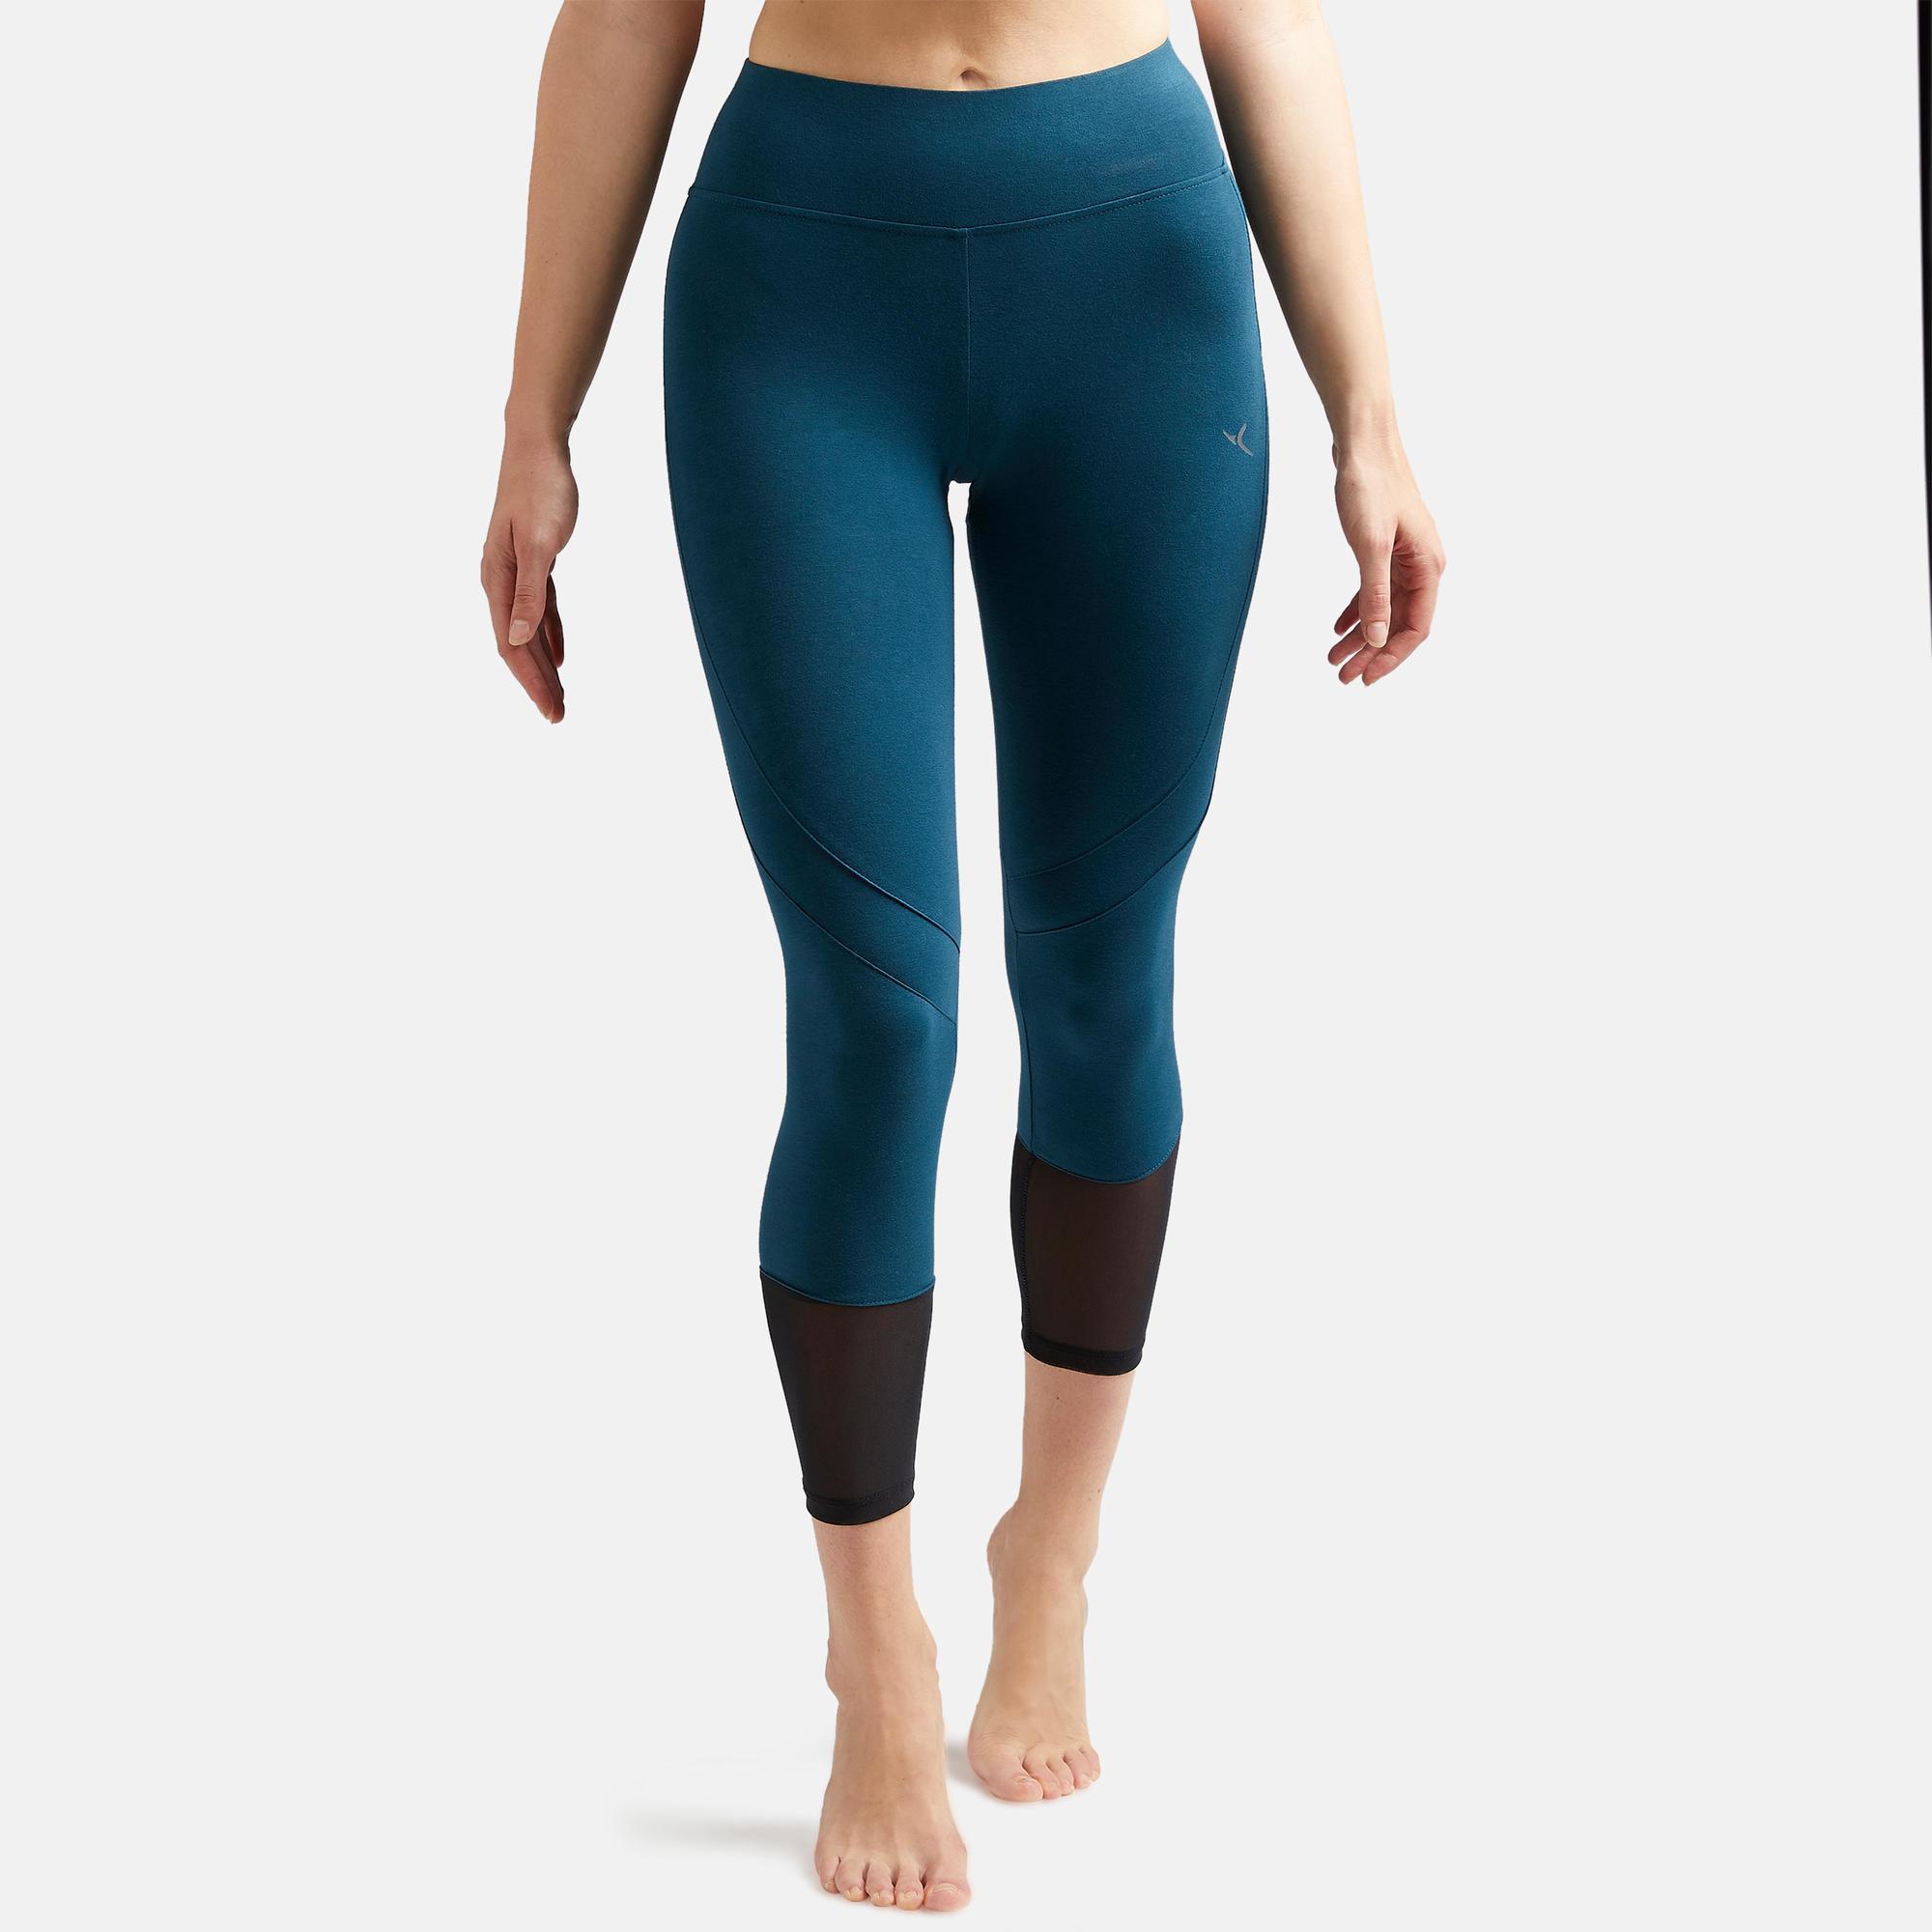 Legging court de sport taille haute 520 femme 78 en coton bleu canard domyos